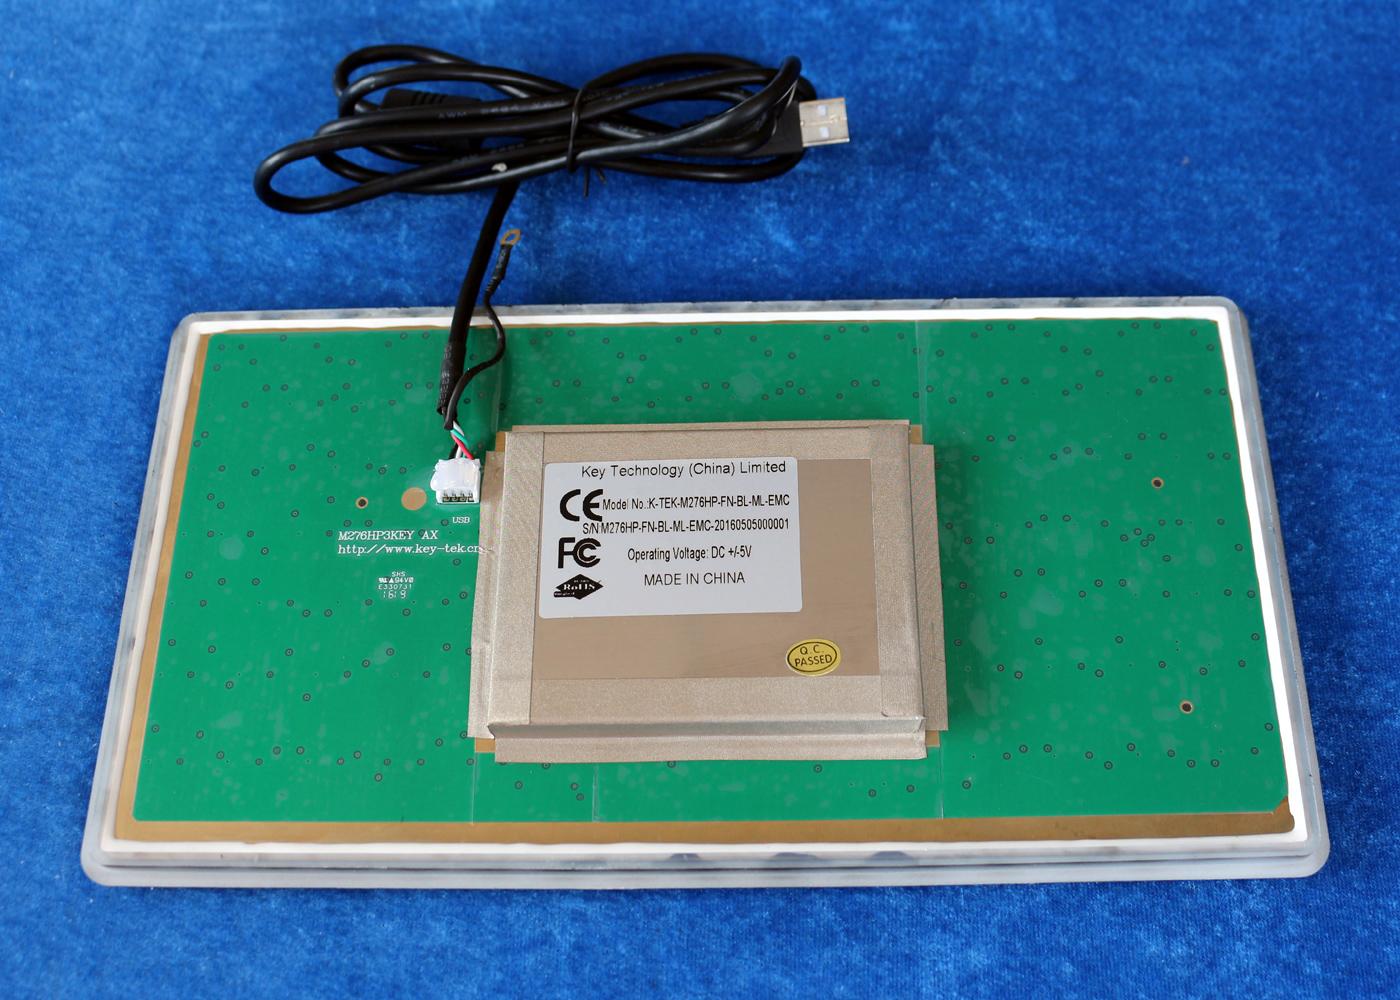 Clavier durci M276HP-FN-OEM-BL-ML-EMC – Vue arrière